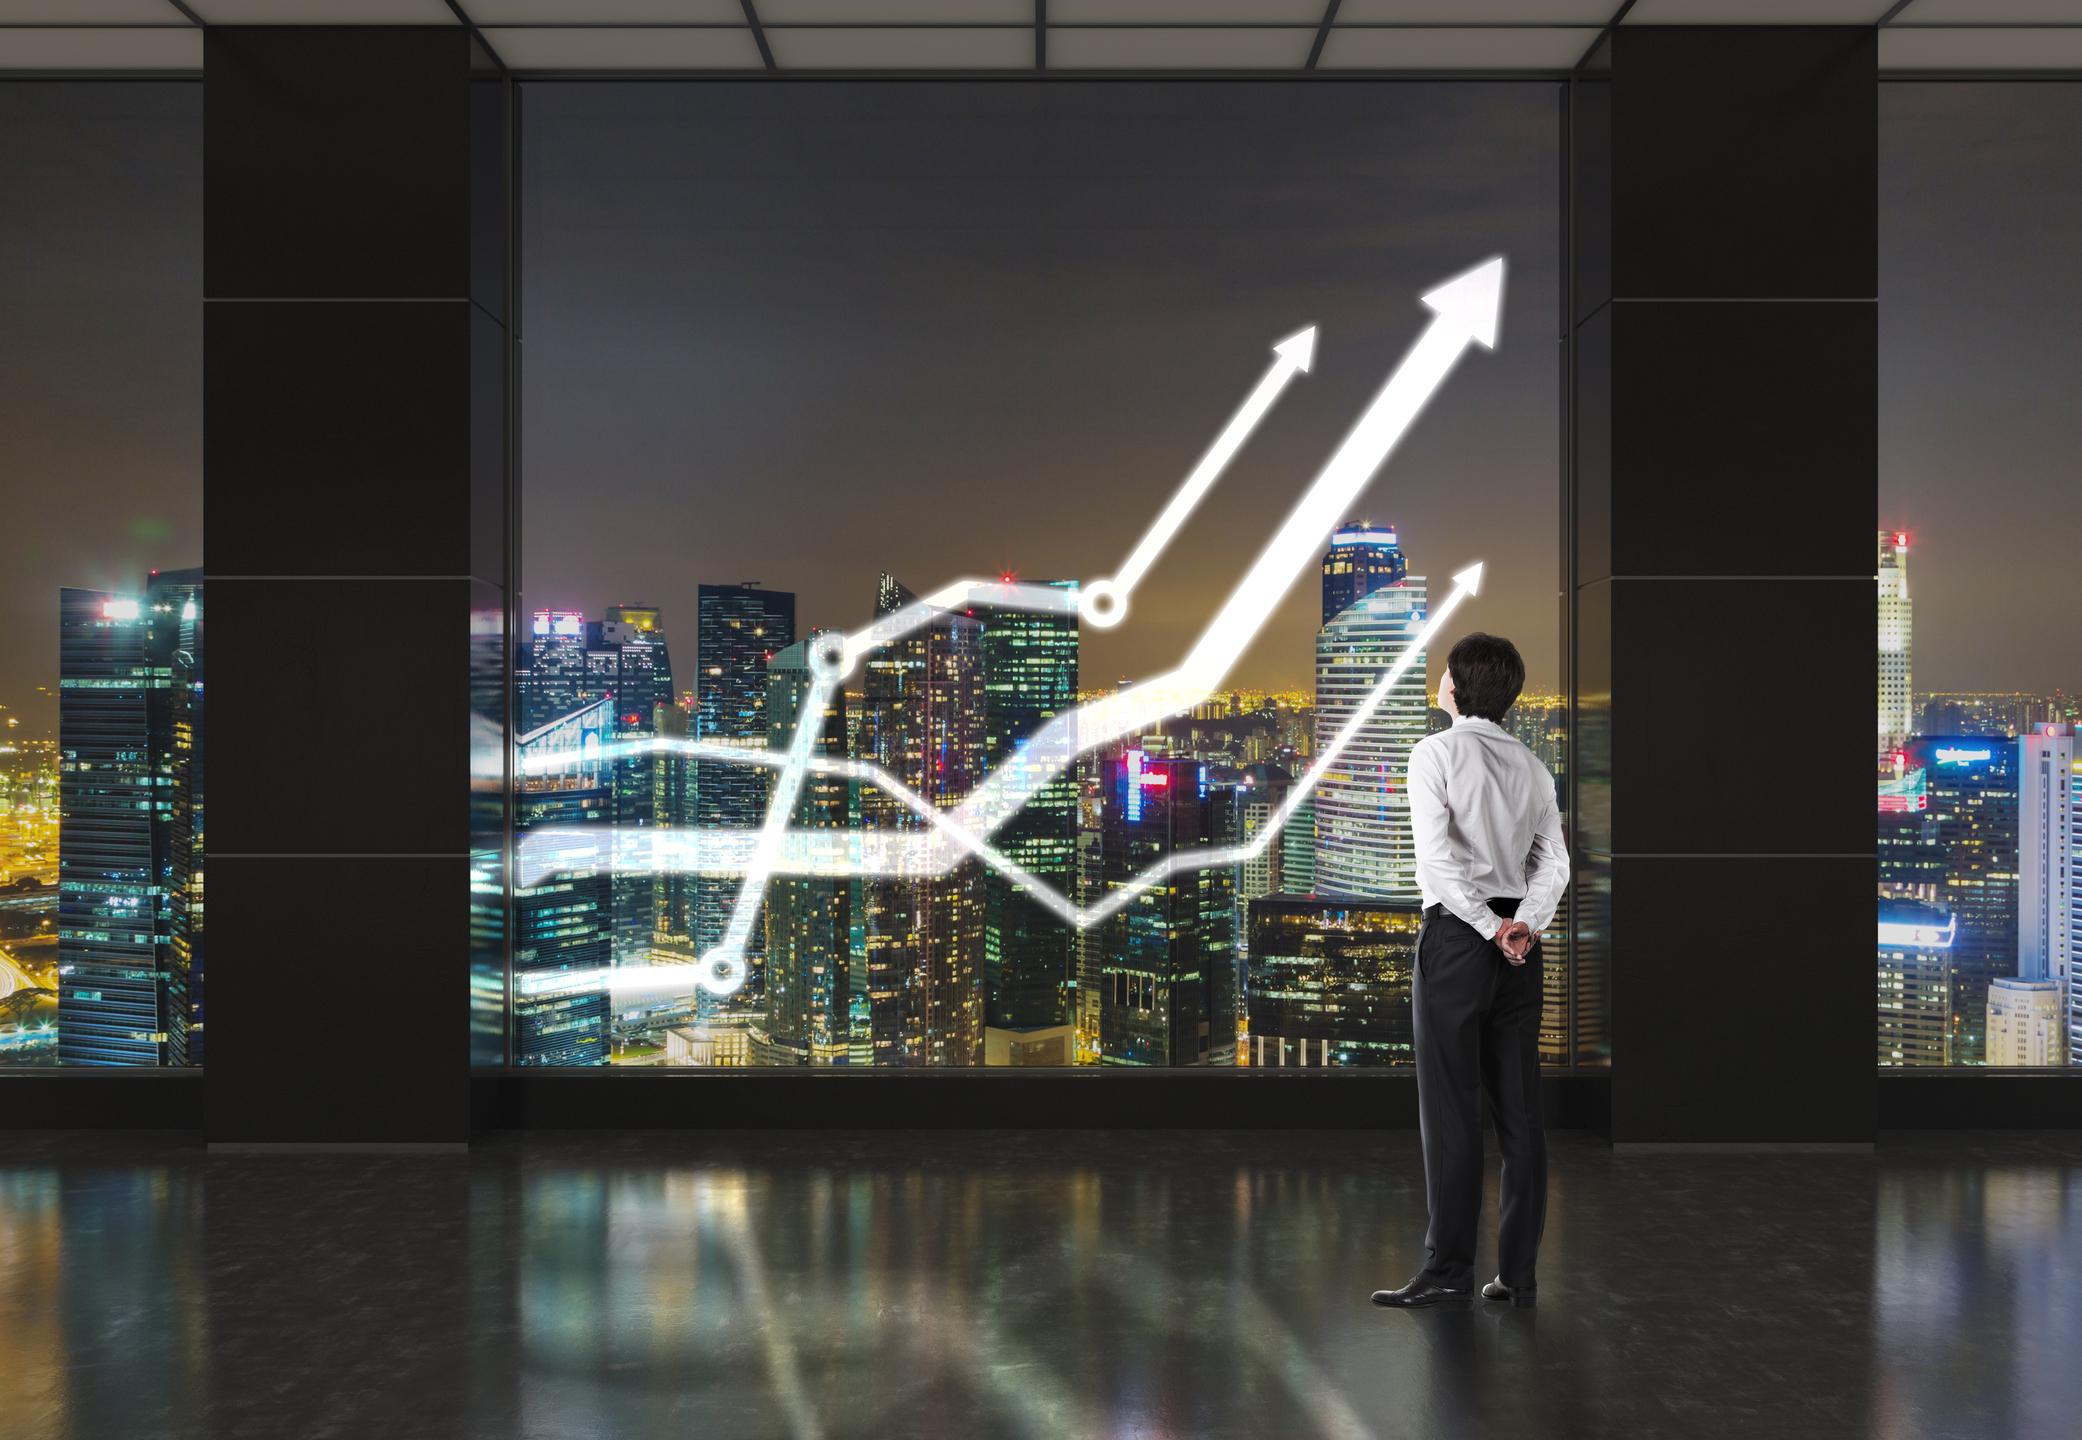 3 Biotech Stocks That Surged Last Week | The Motley Fool